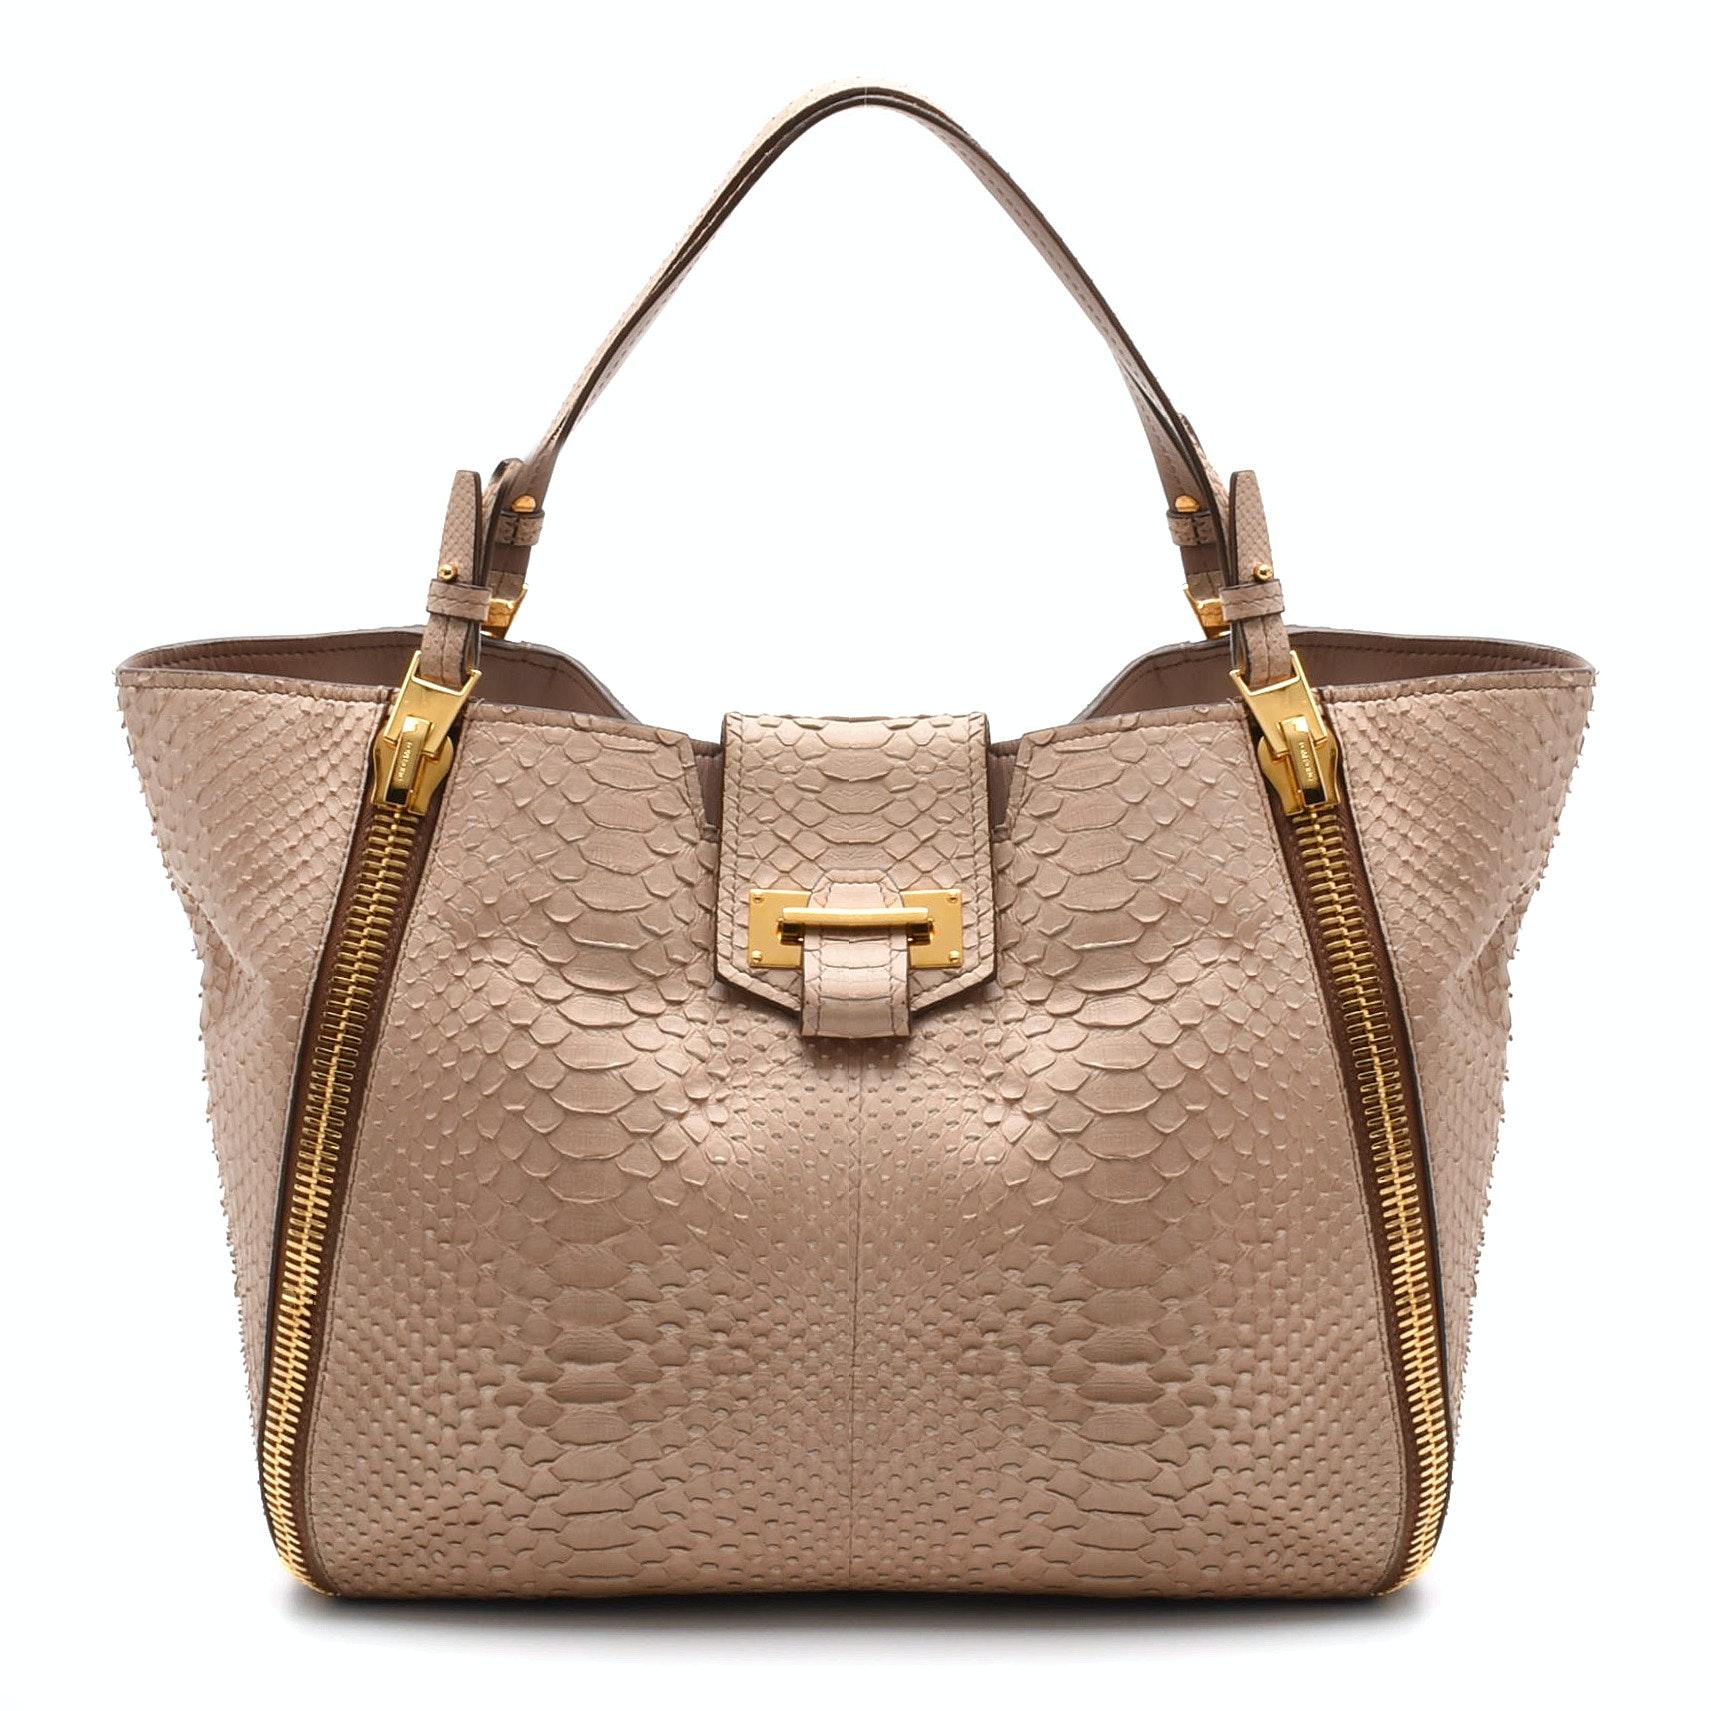 Tom Ford Sedgwick Python Skin and Leather Tote Handbag